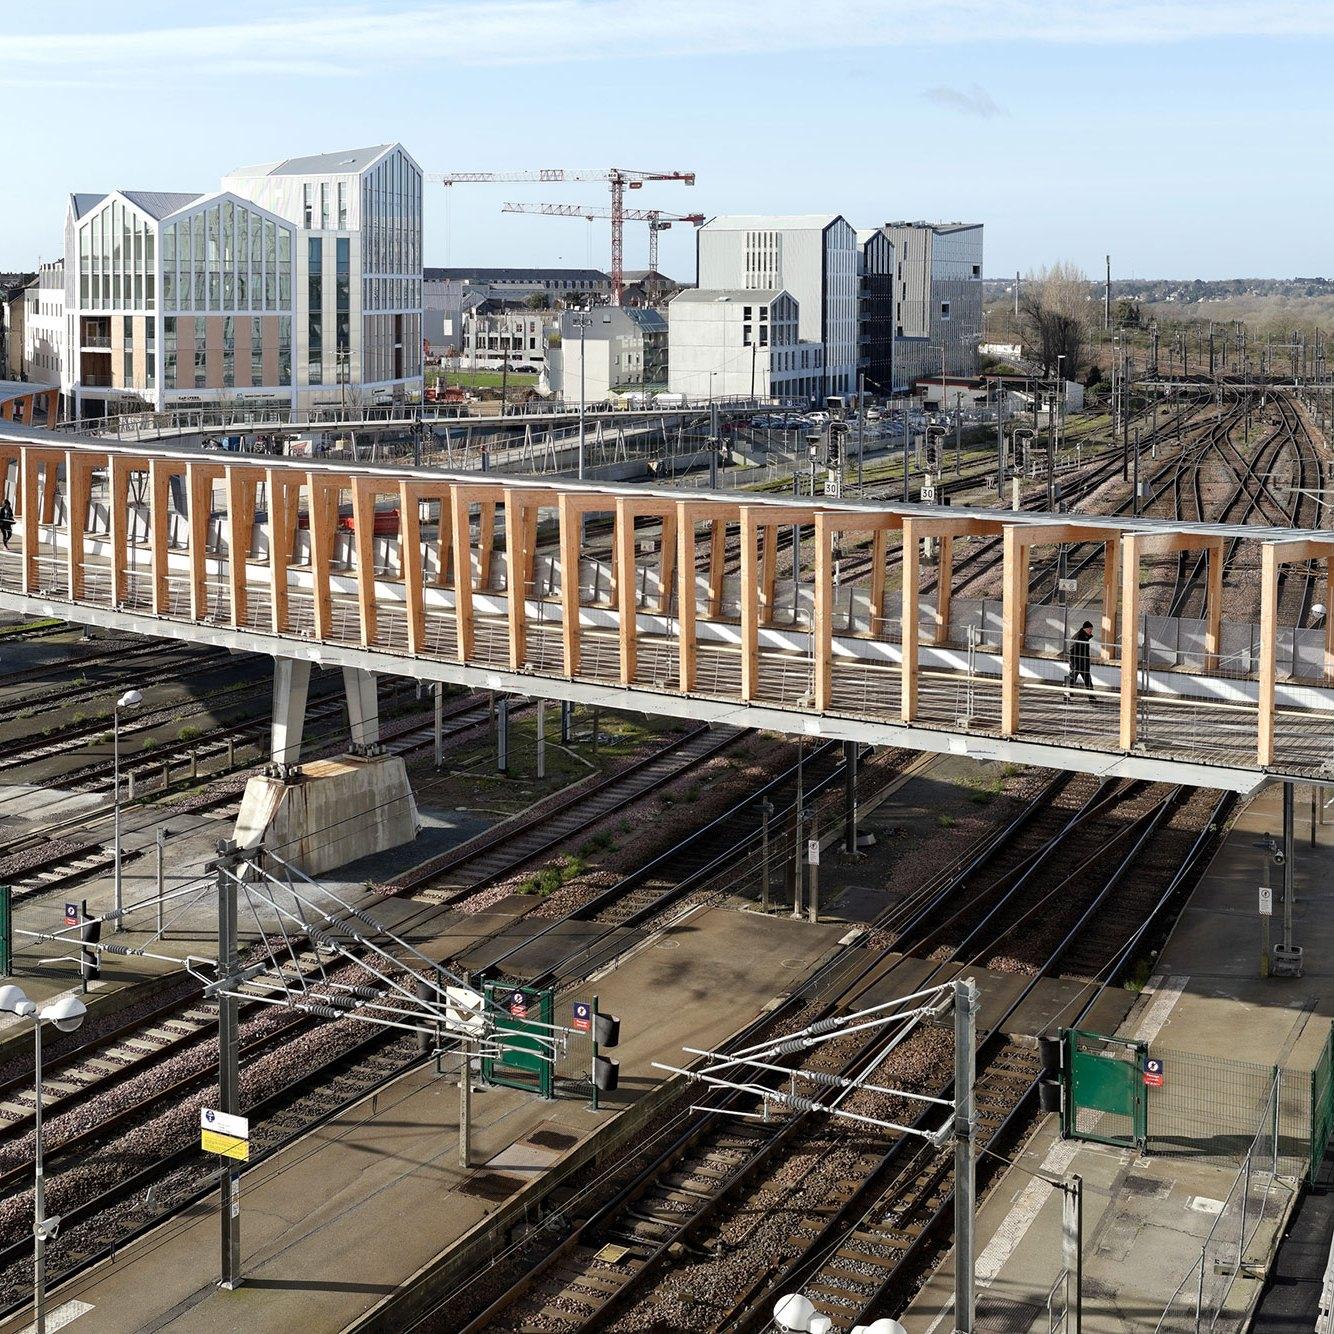 Overview Aerial Bridge View